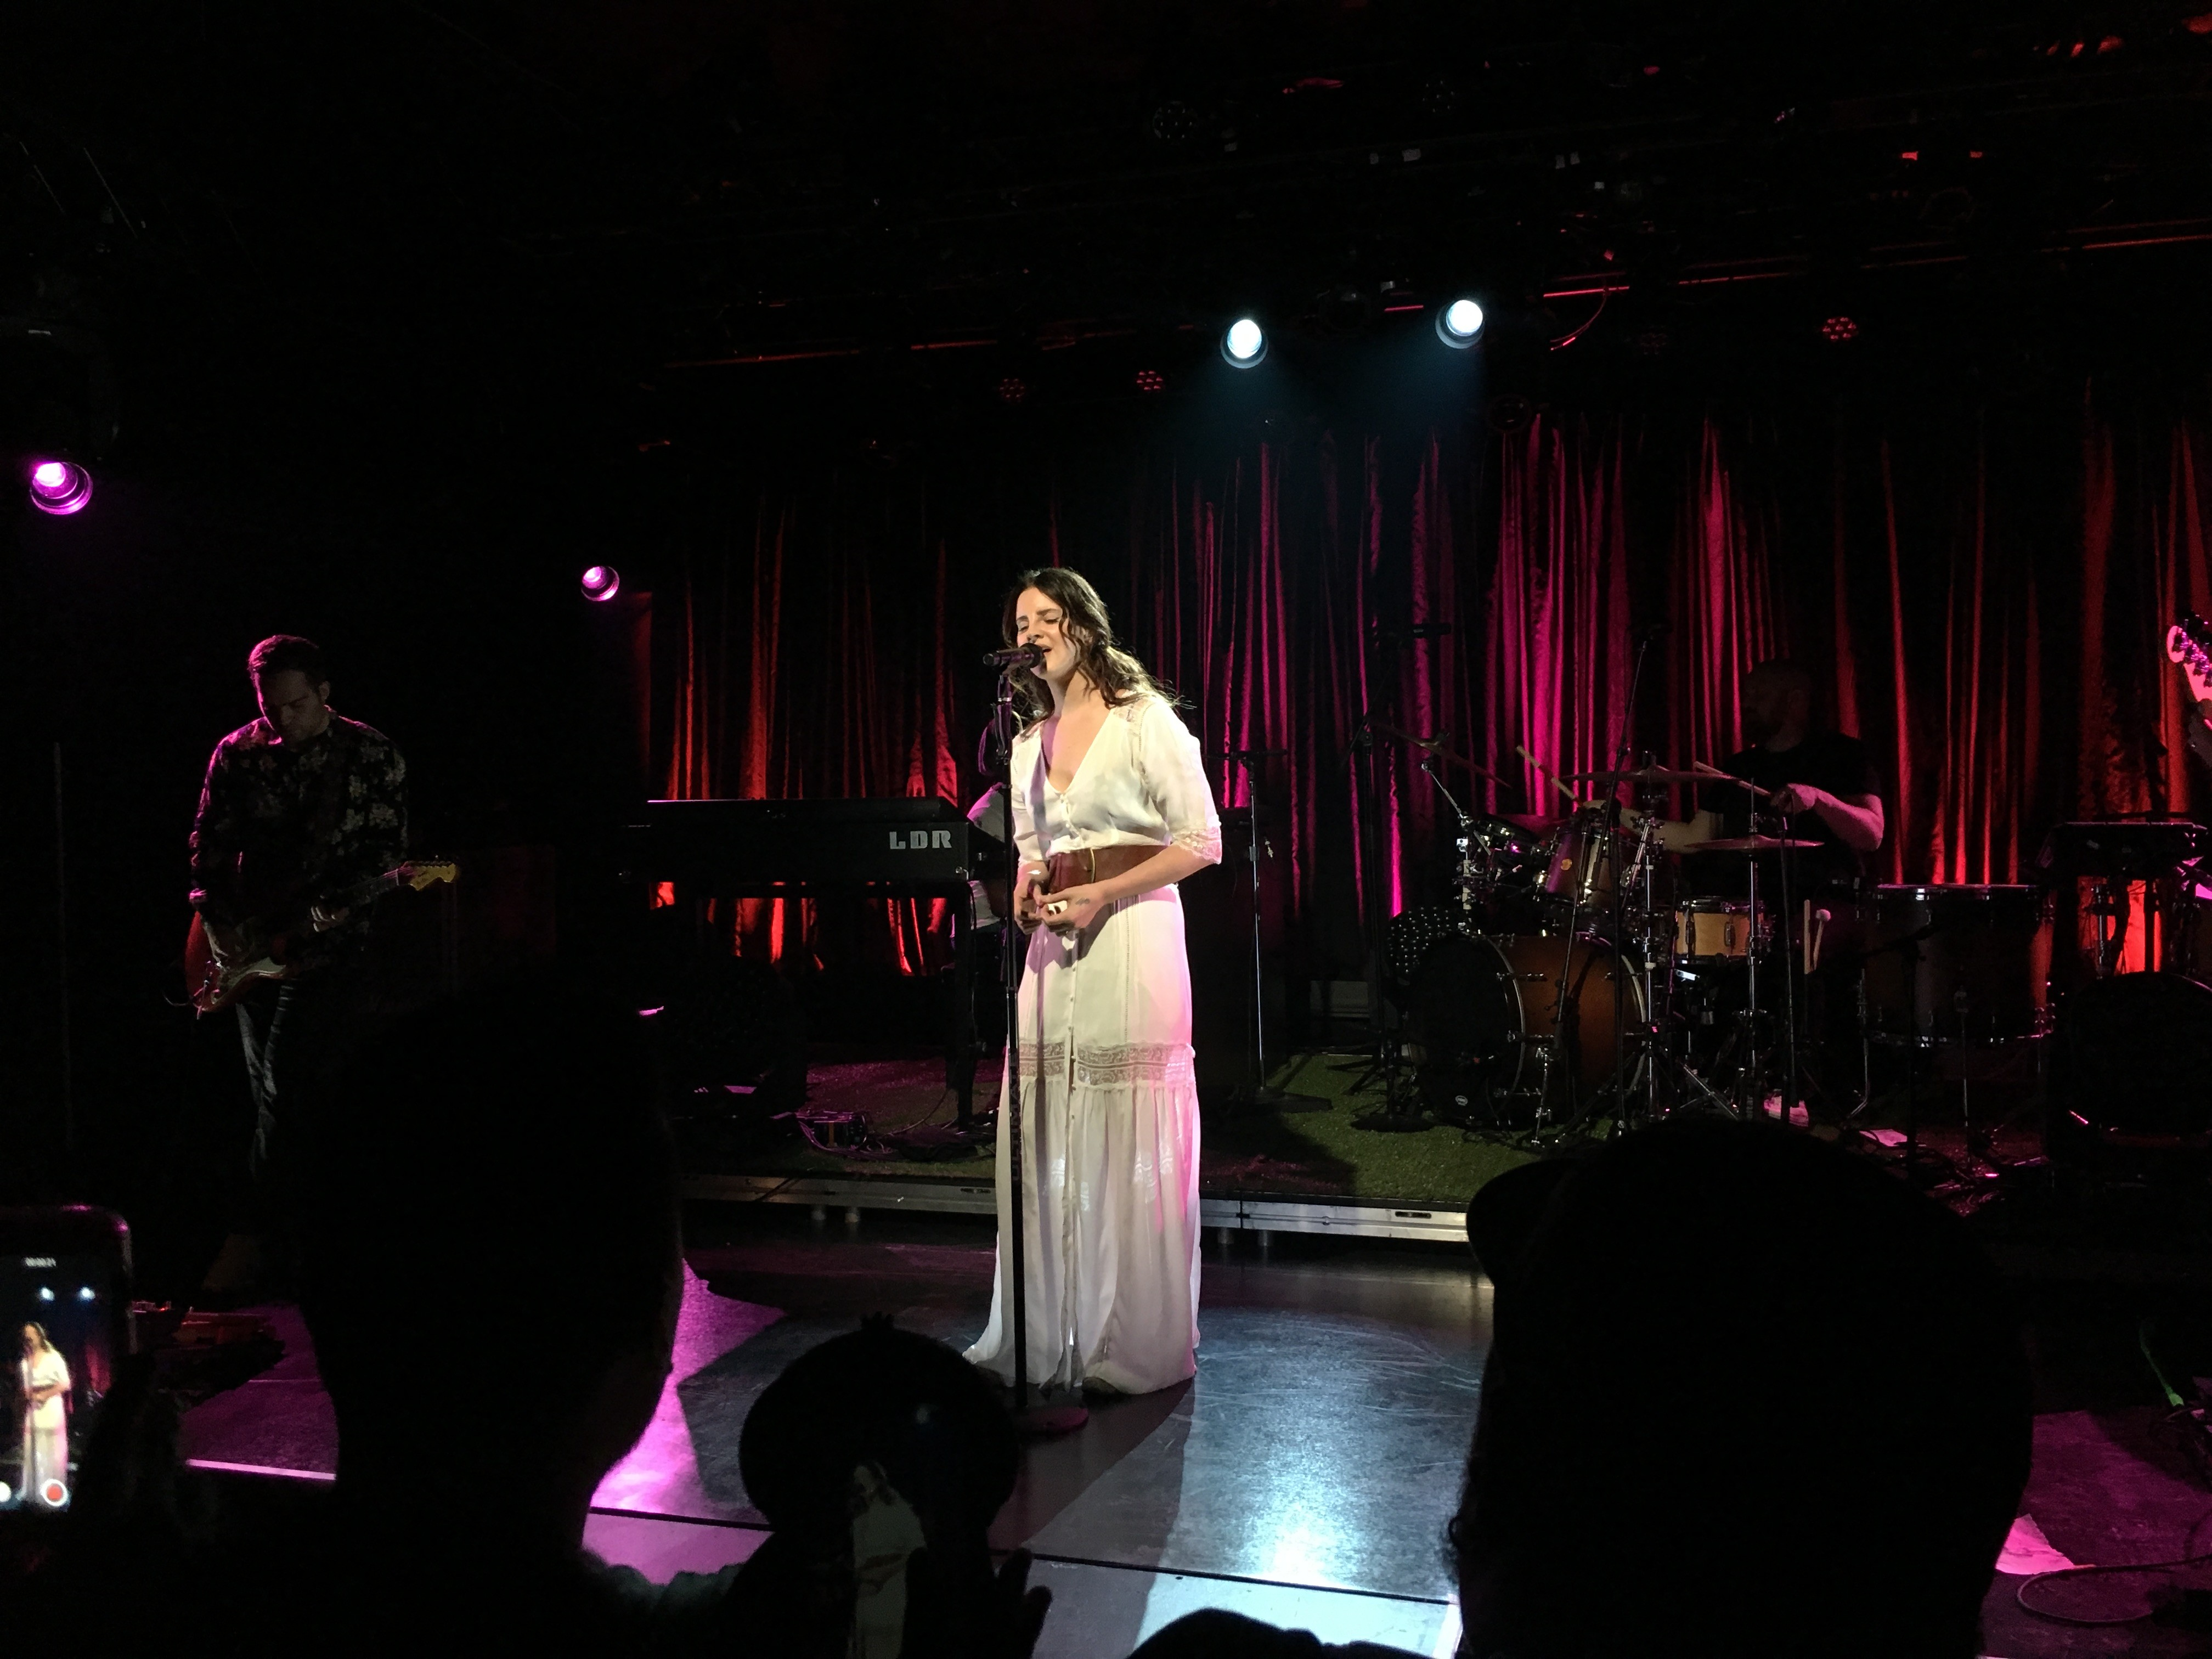 lana-del-rey-love-live-sxsw-video